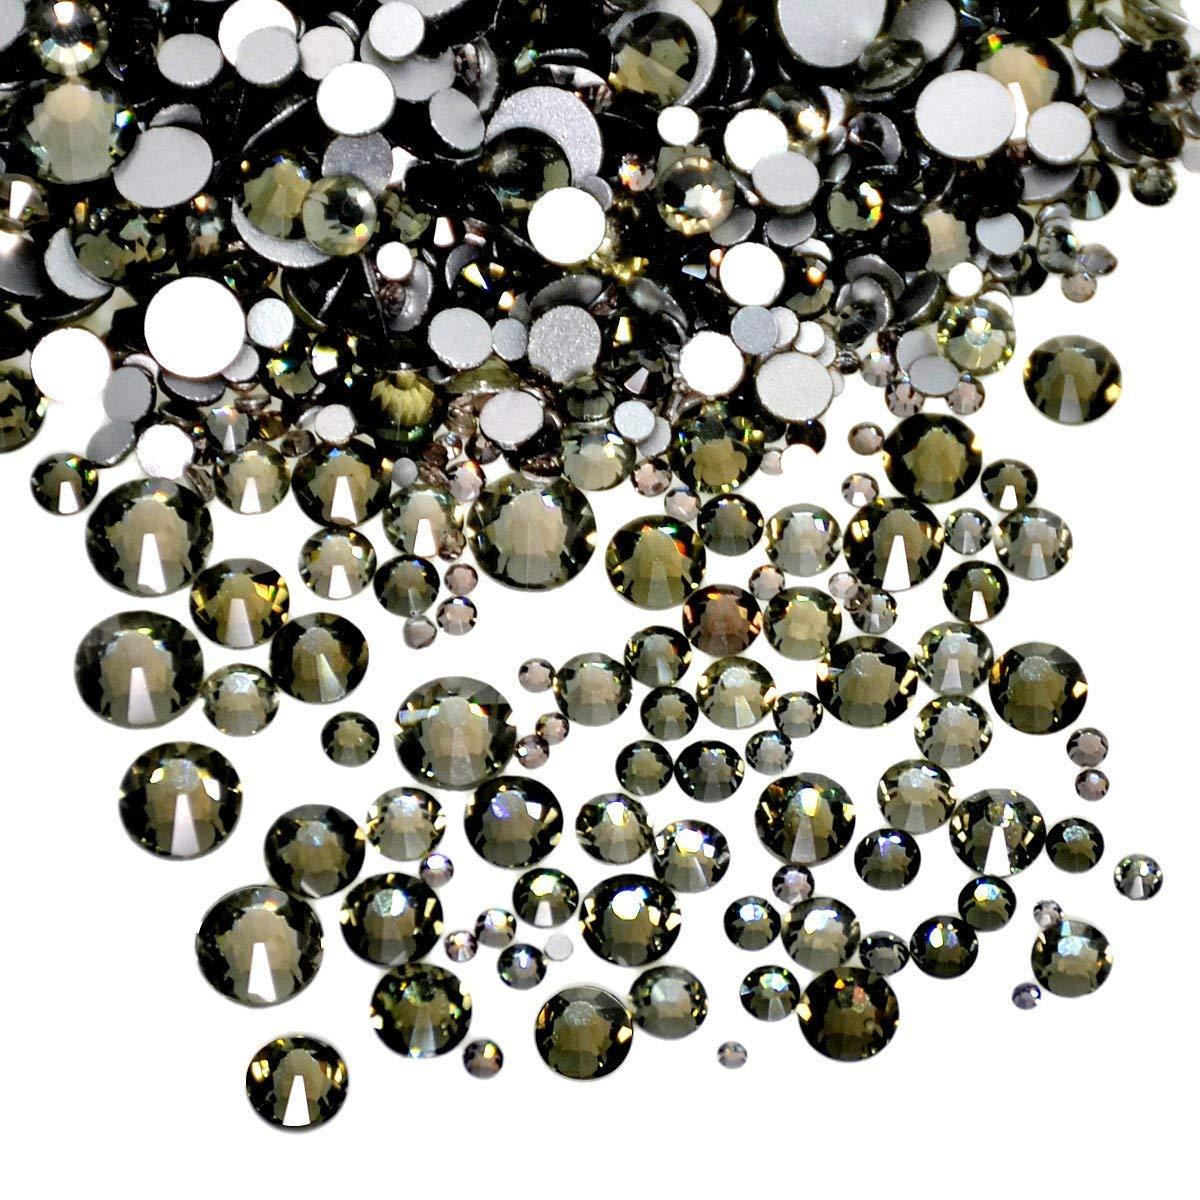 (Black Diamond 04) - AD Beads 1440pcs Mixed Size Non Hotfix Quality Rhinestones Flatback Nail Art Pick Colour (Black Diamond 04)  Black Diamond 04 B07171Z53W